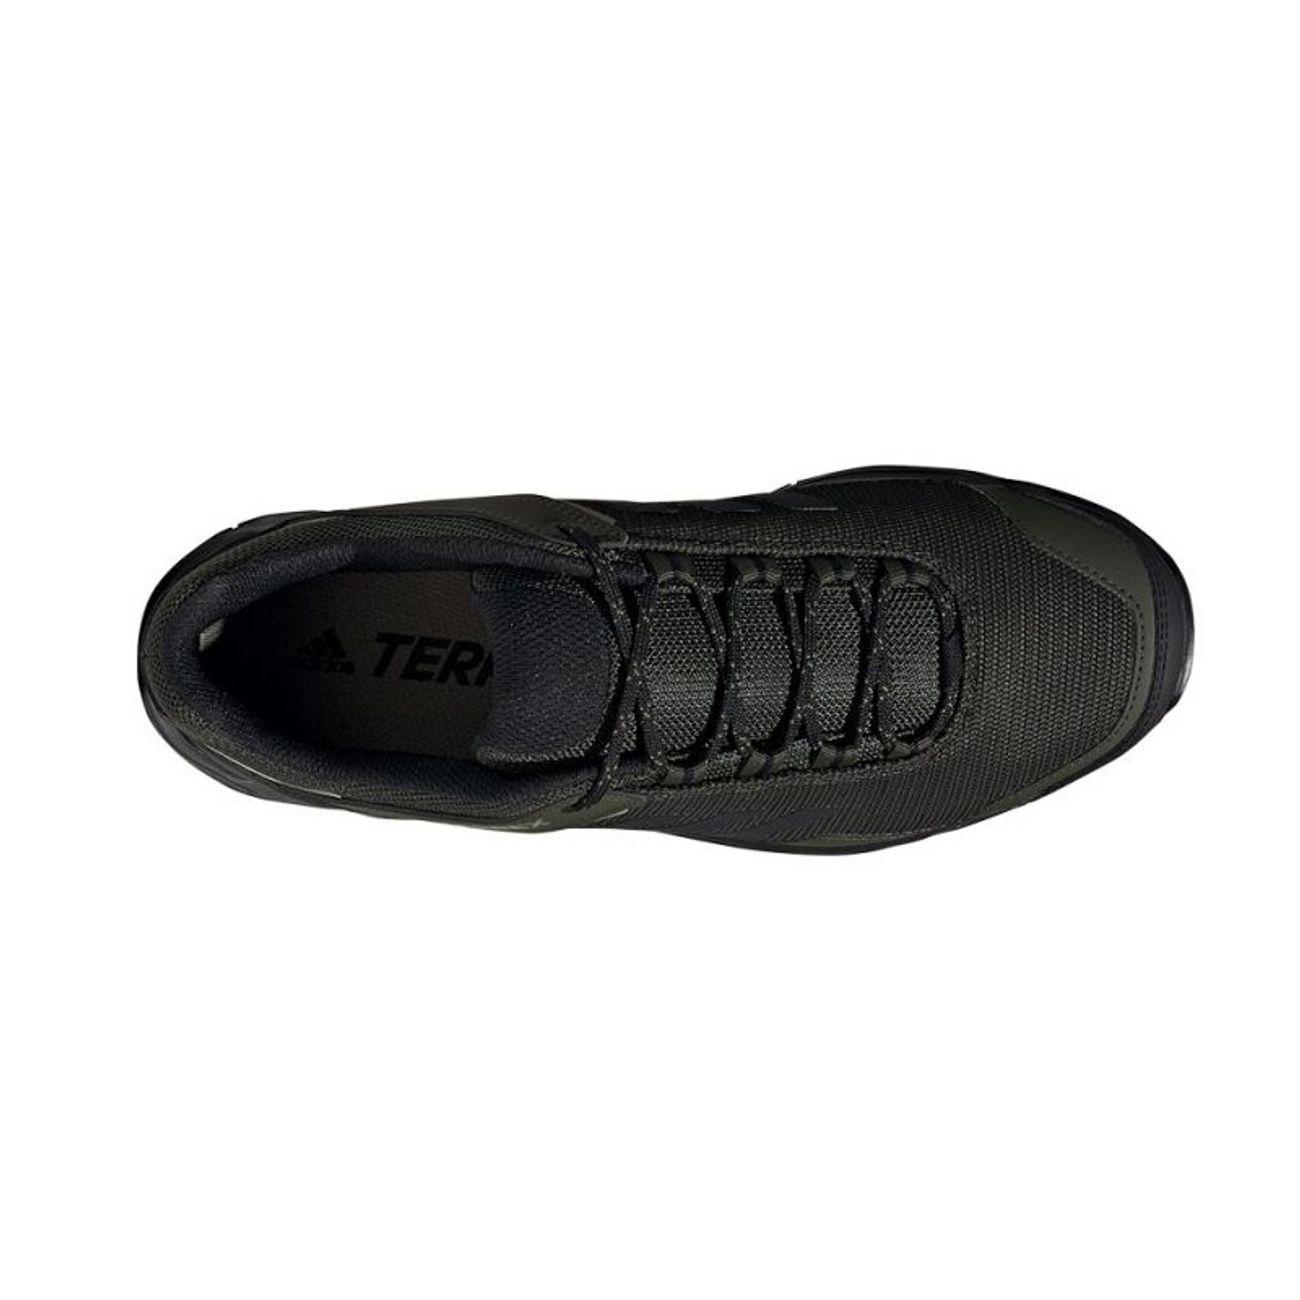 Adidas Padel Noir Bc0974 Terrex Adulte Eastrail Vert LzMjqSUVpG